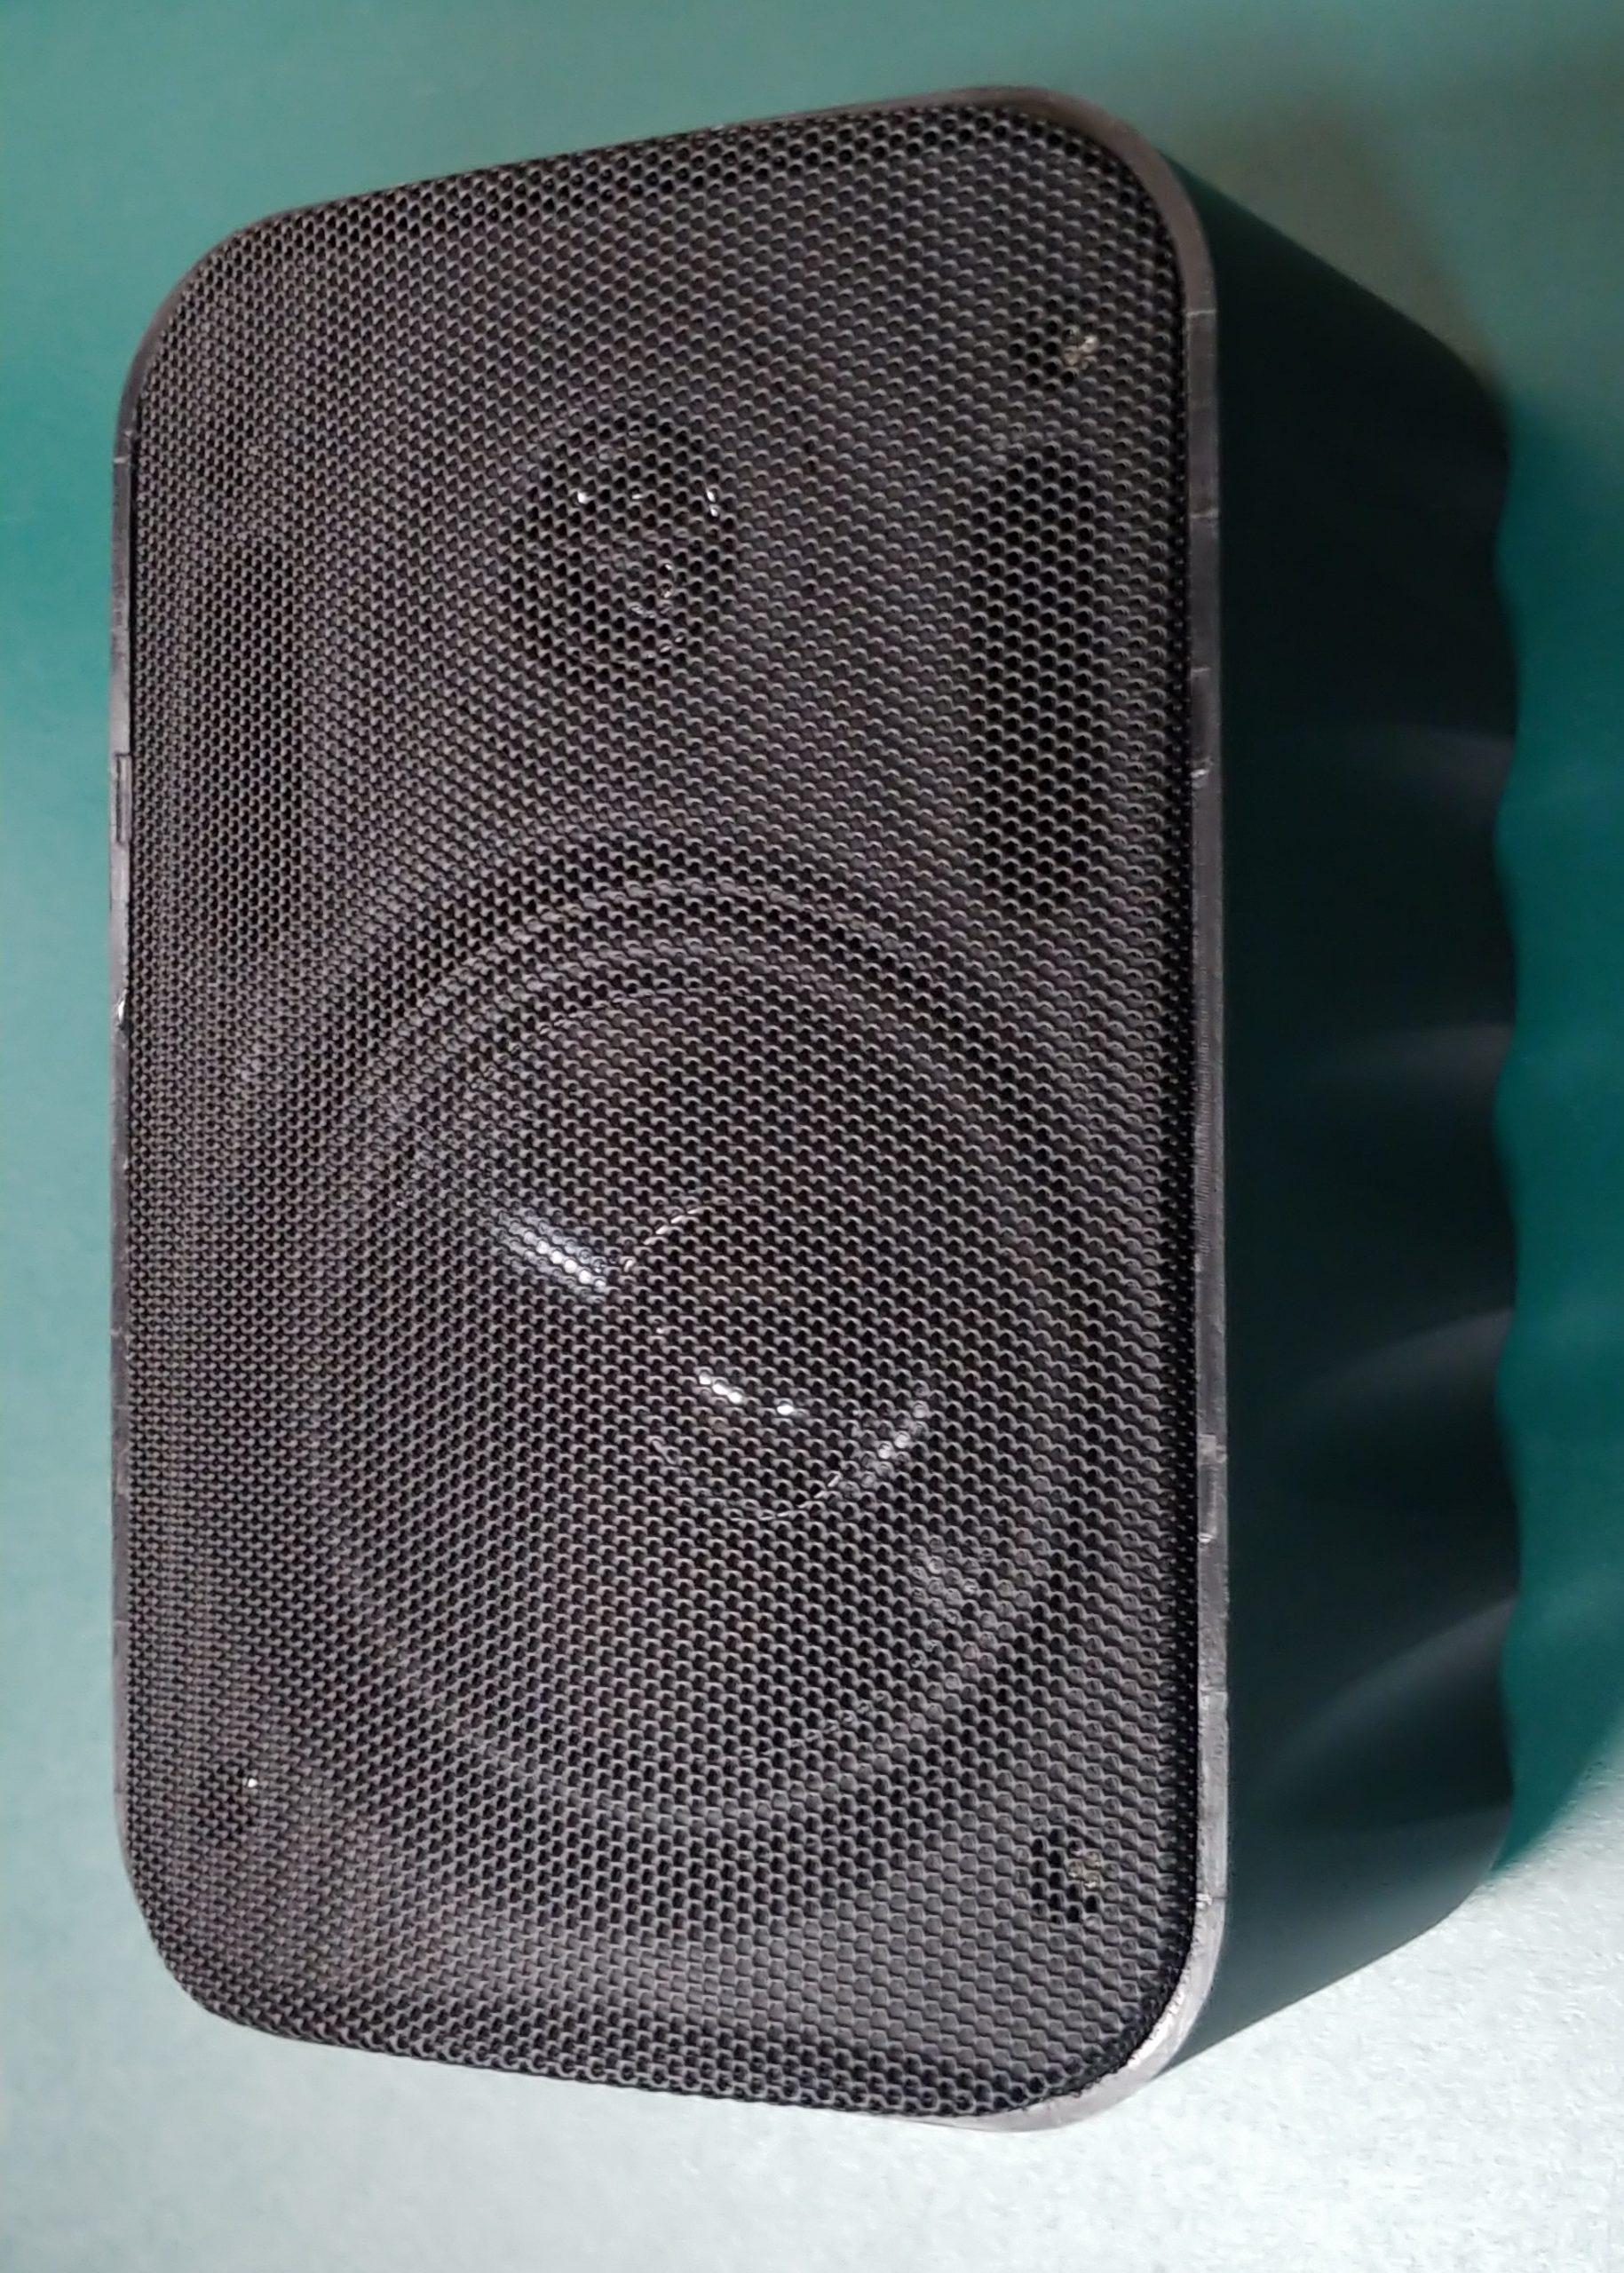 EMS555T   50 Watt / 70 Volt 2 Way Cabinet Speaker, Black